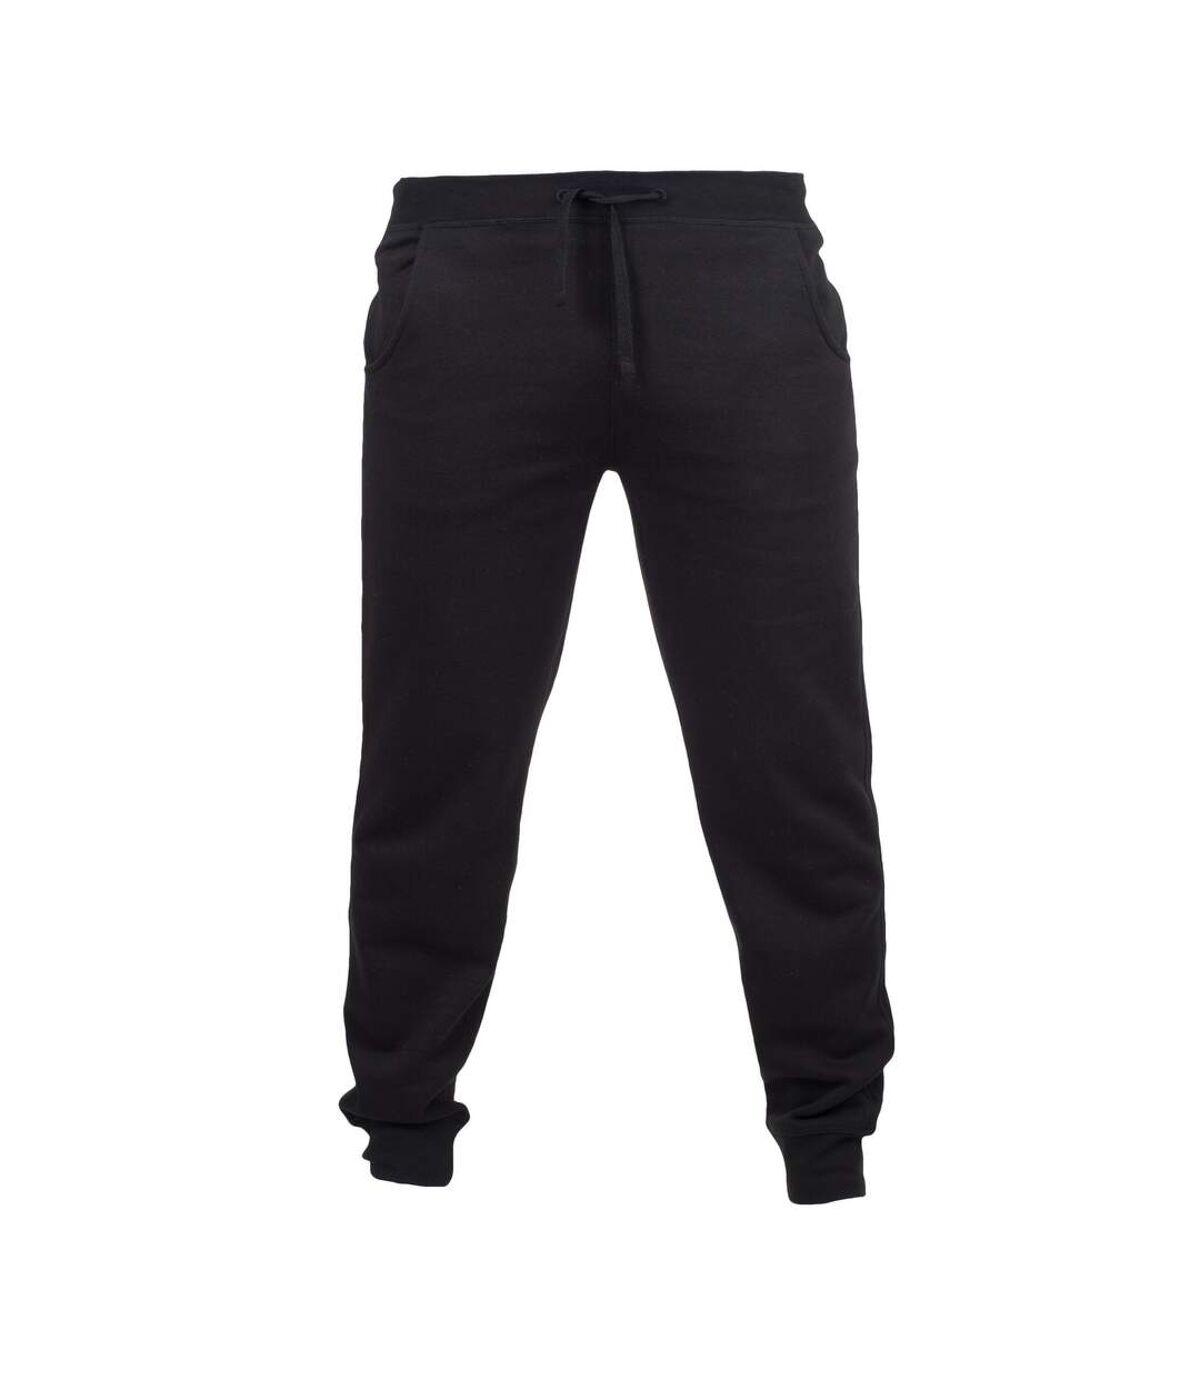 Skinnifit Mens Slim Cuffed Jogging Bottoms/Trousers (Black) - UTRW4743